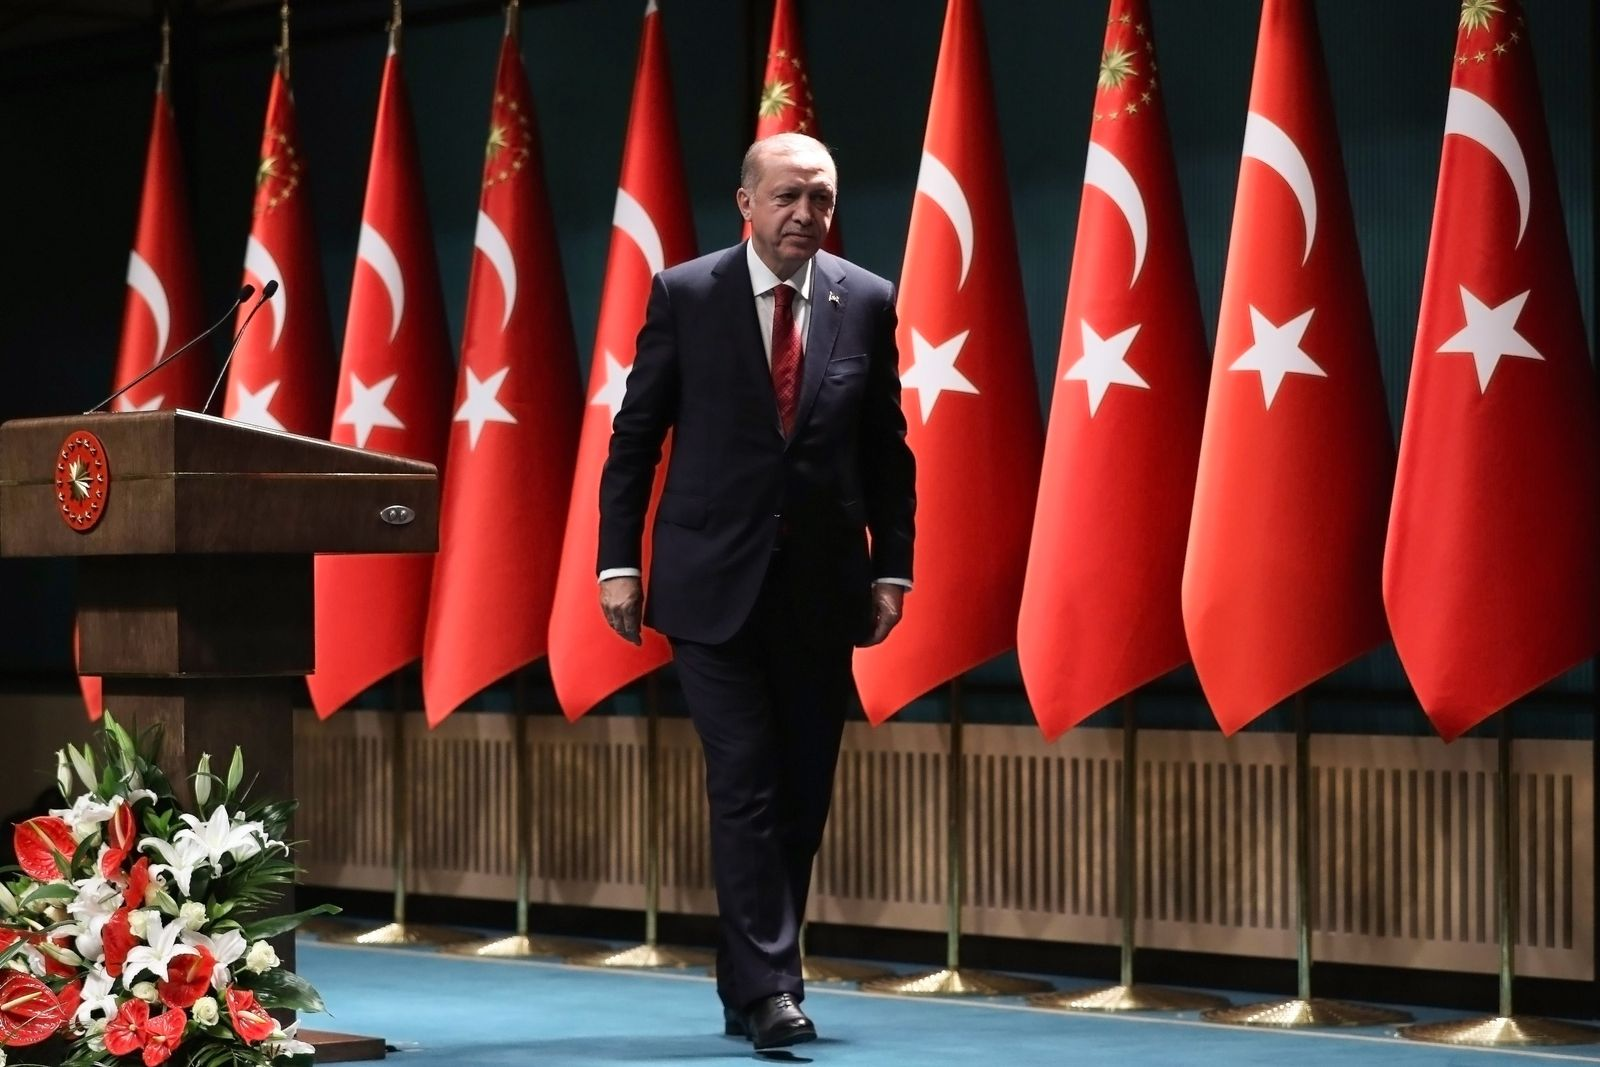 TURKEY-POLITICS-ELECTION